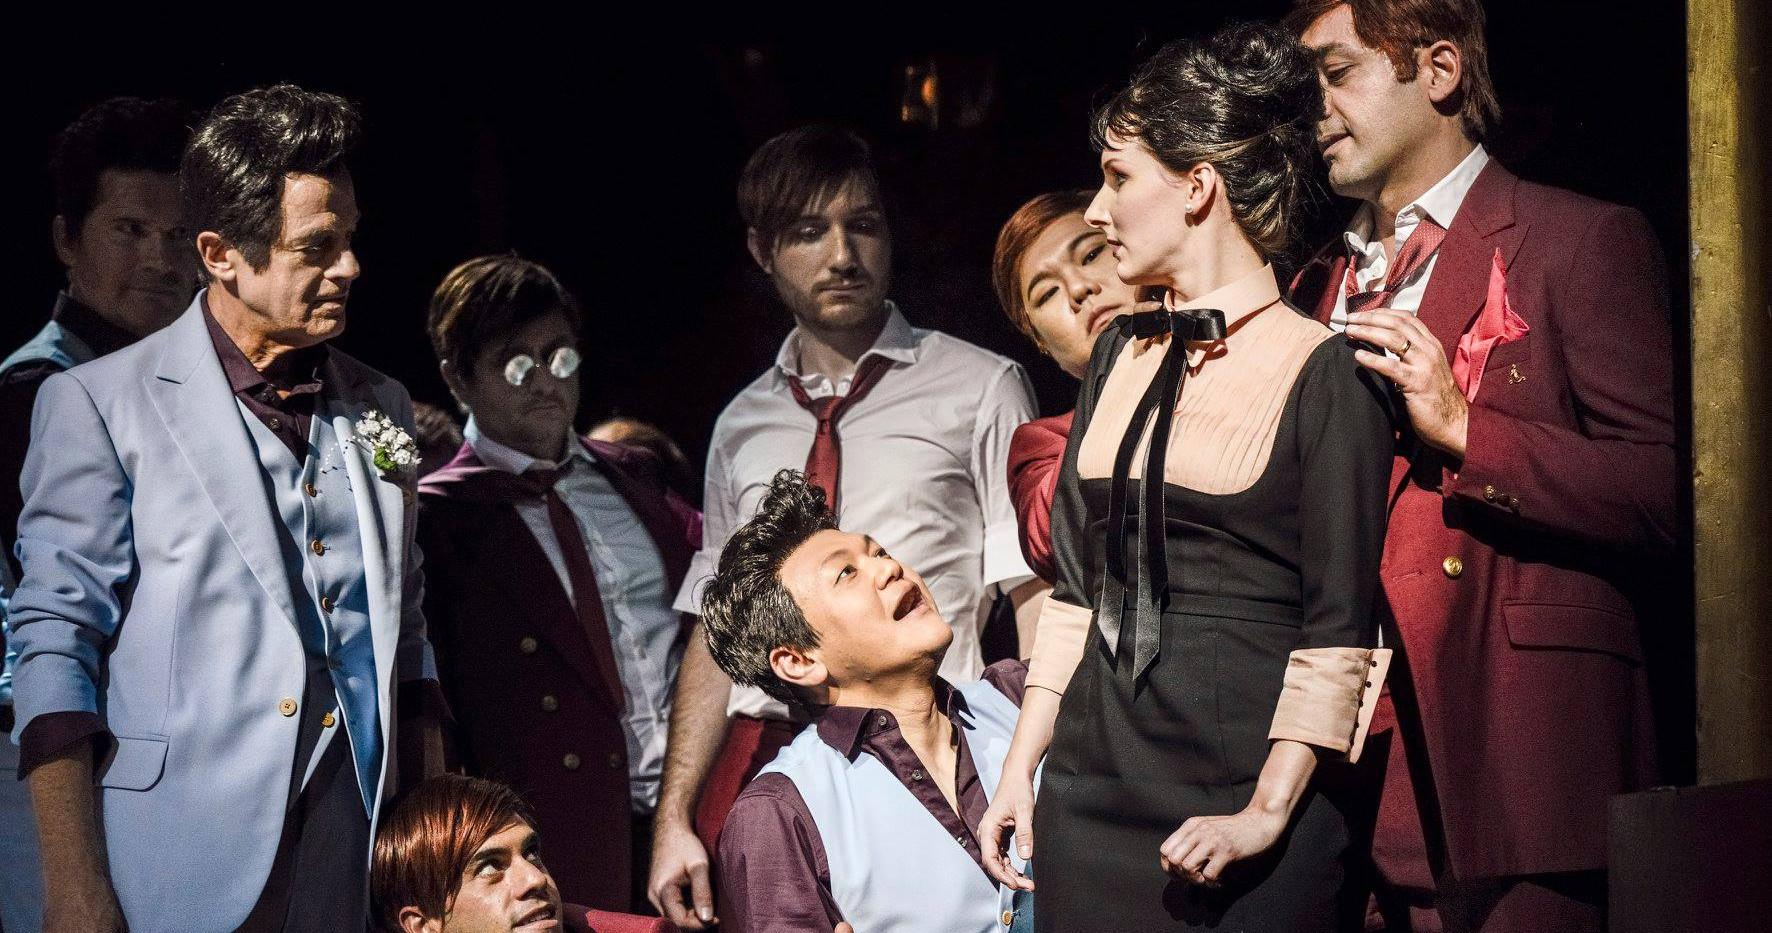 Despina in Mozart's Cosi fan tutte